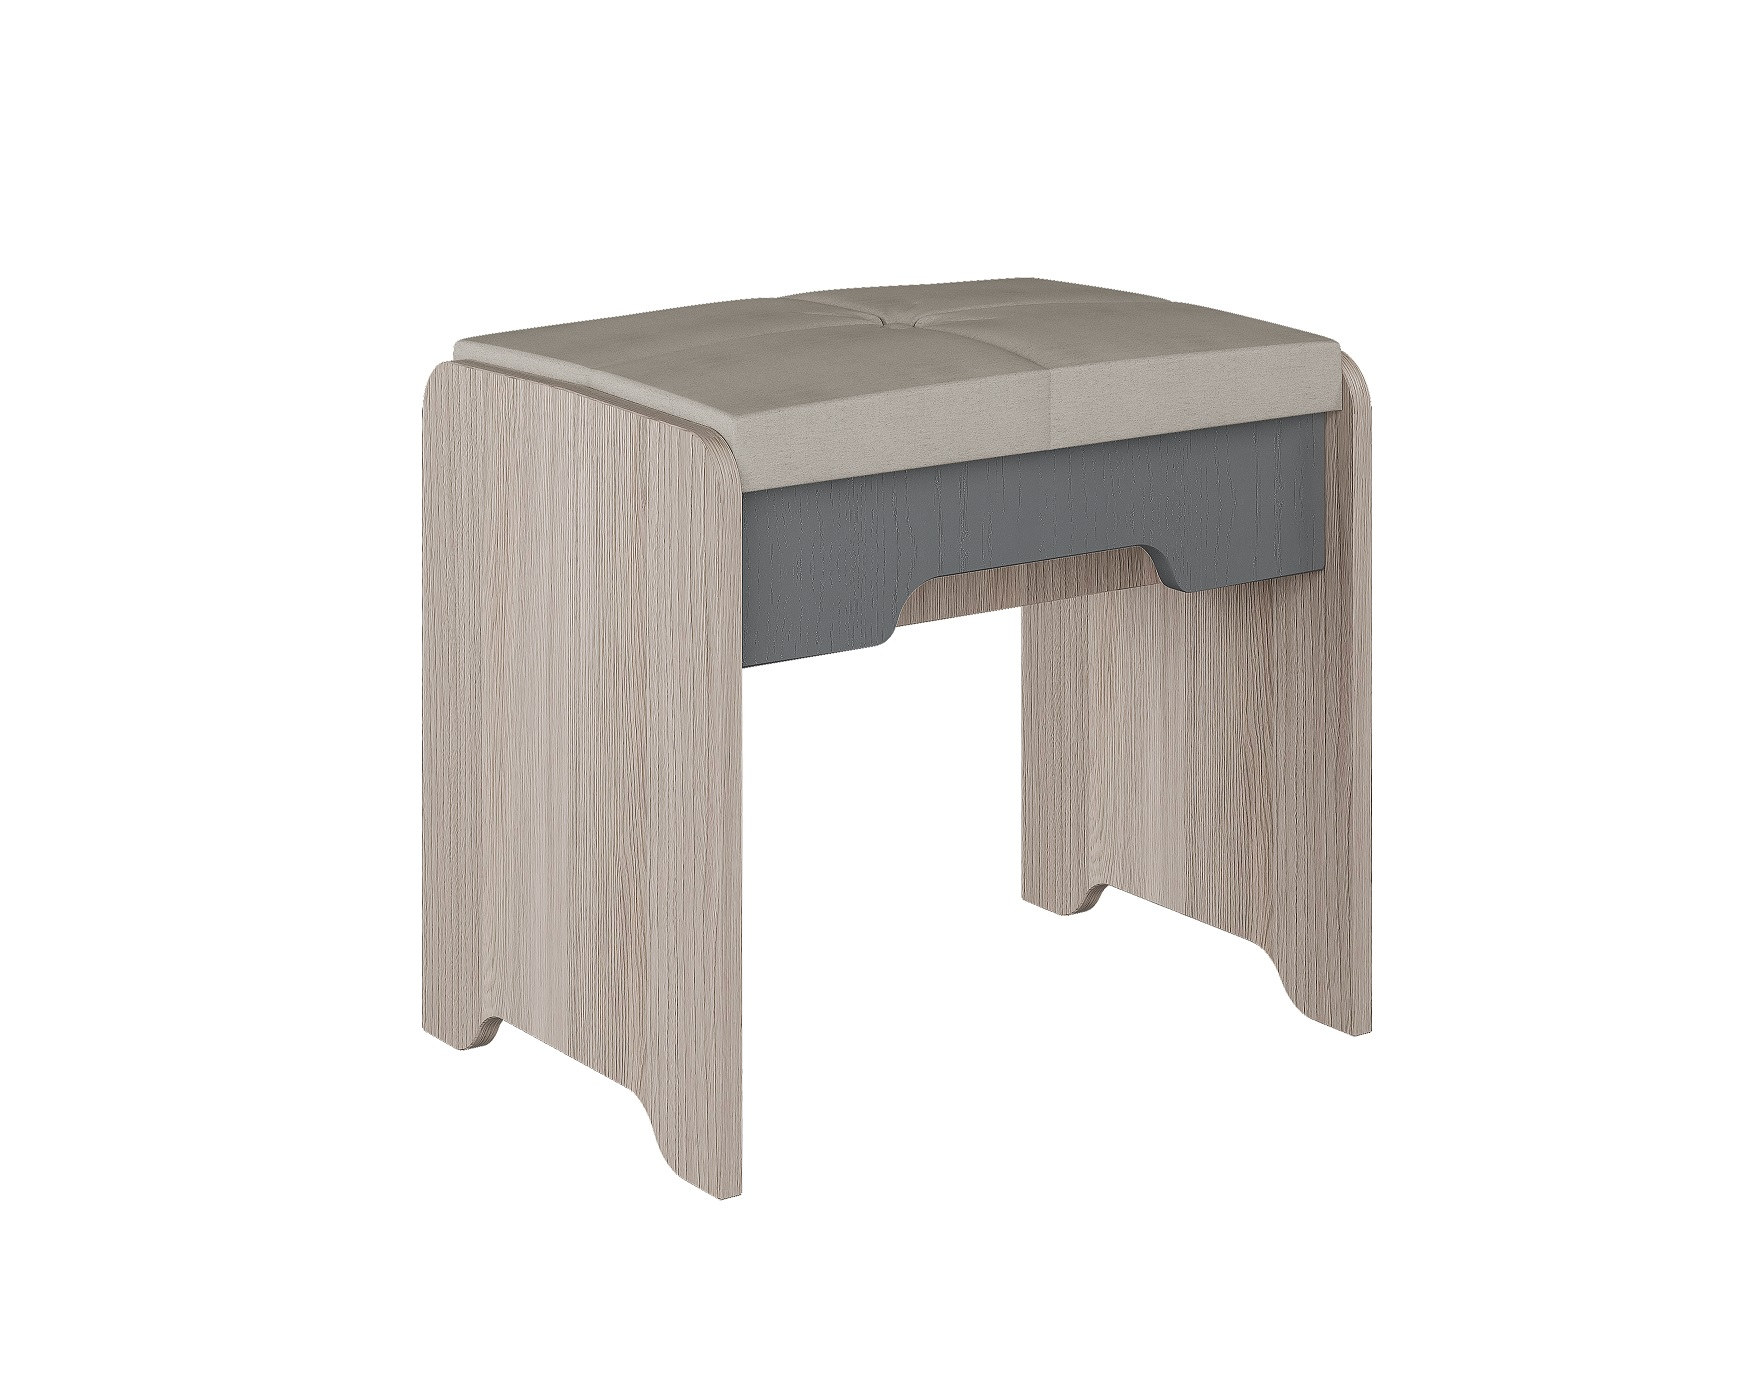 Продажа мебели в интернет-магазине ВашаКомната.РФ – фото 1.6